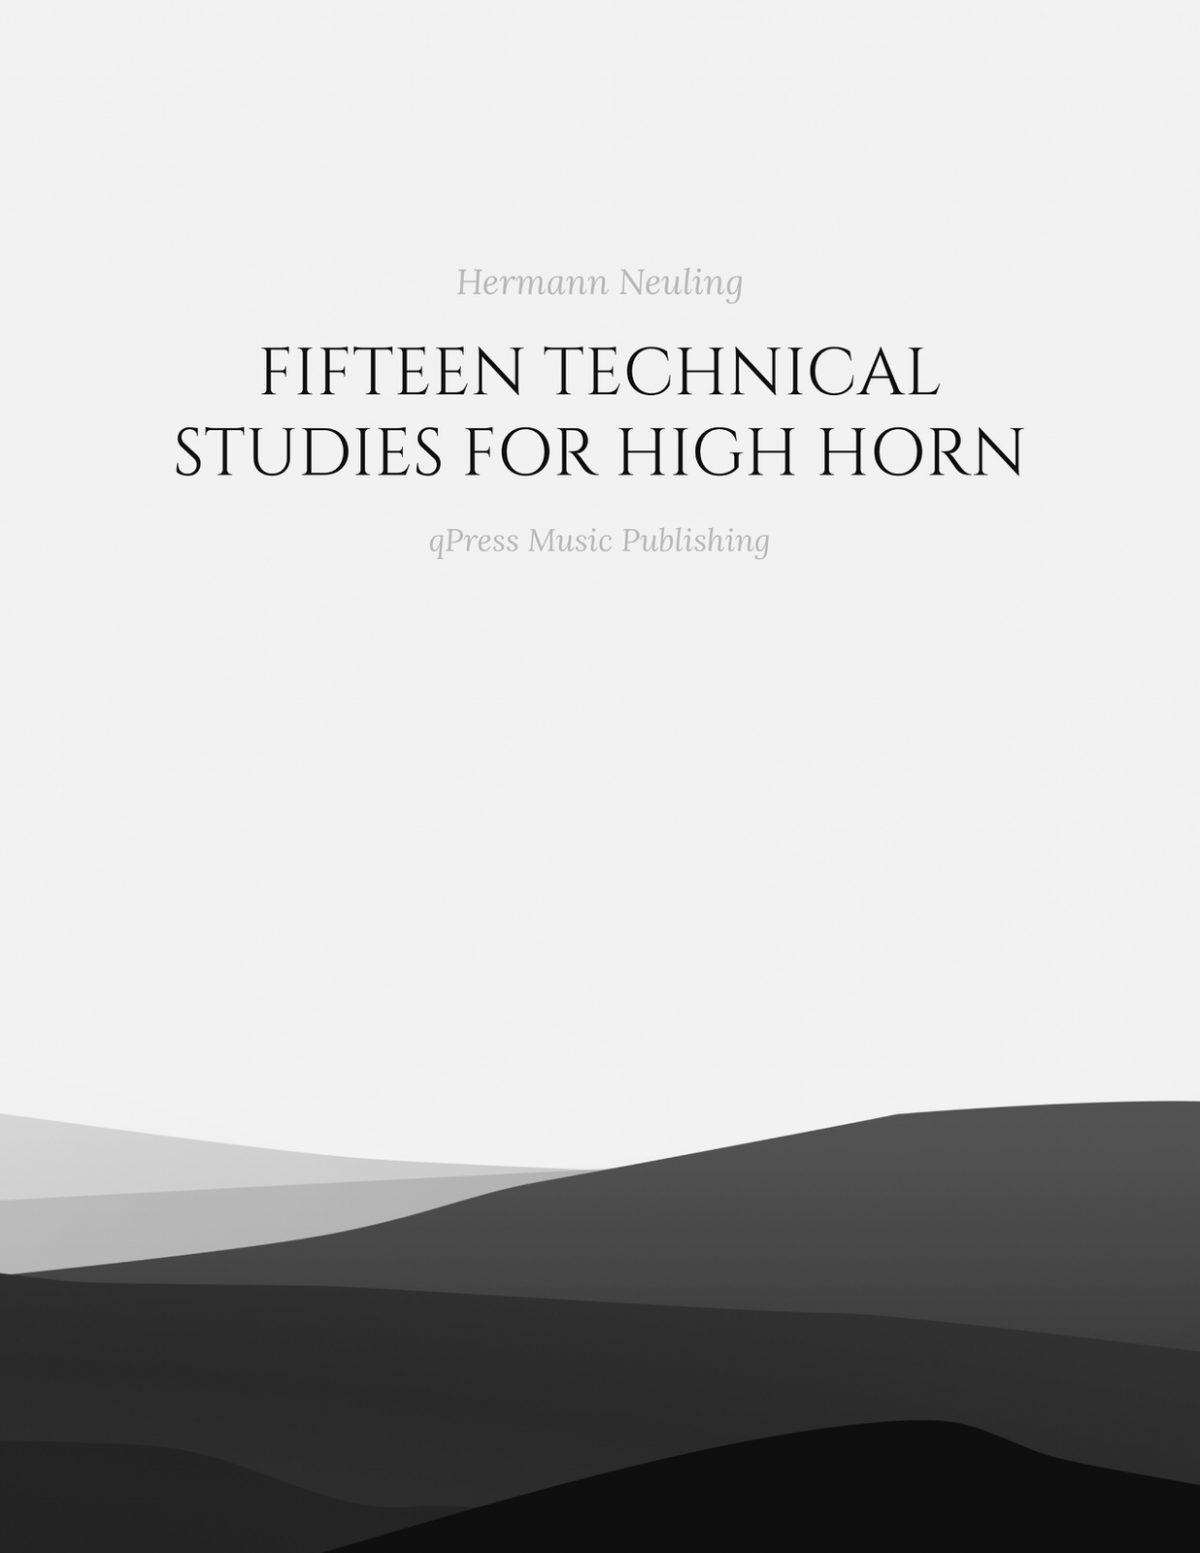 Neuling, 15 Technical Studies for High Horn